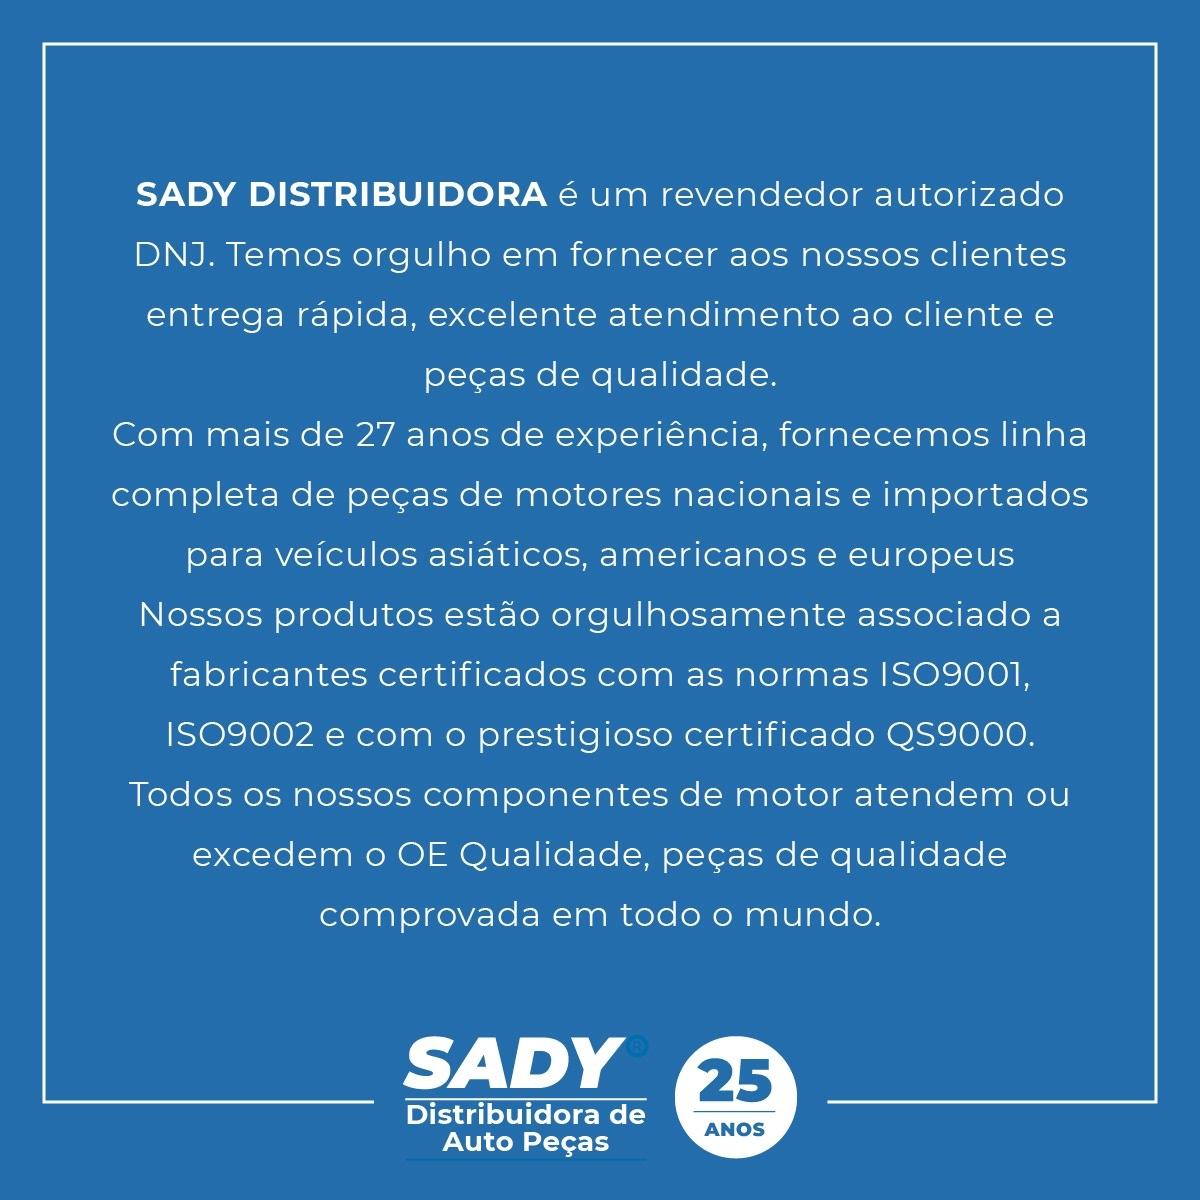 BOMBA DE OLEO DO MOTOR MERCEDES 3.0 24V TDI